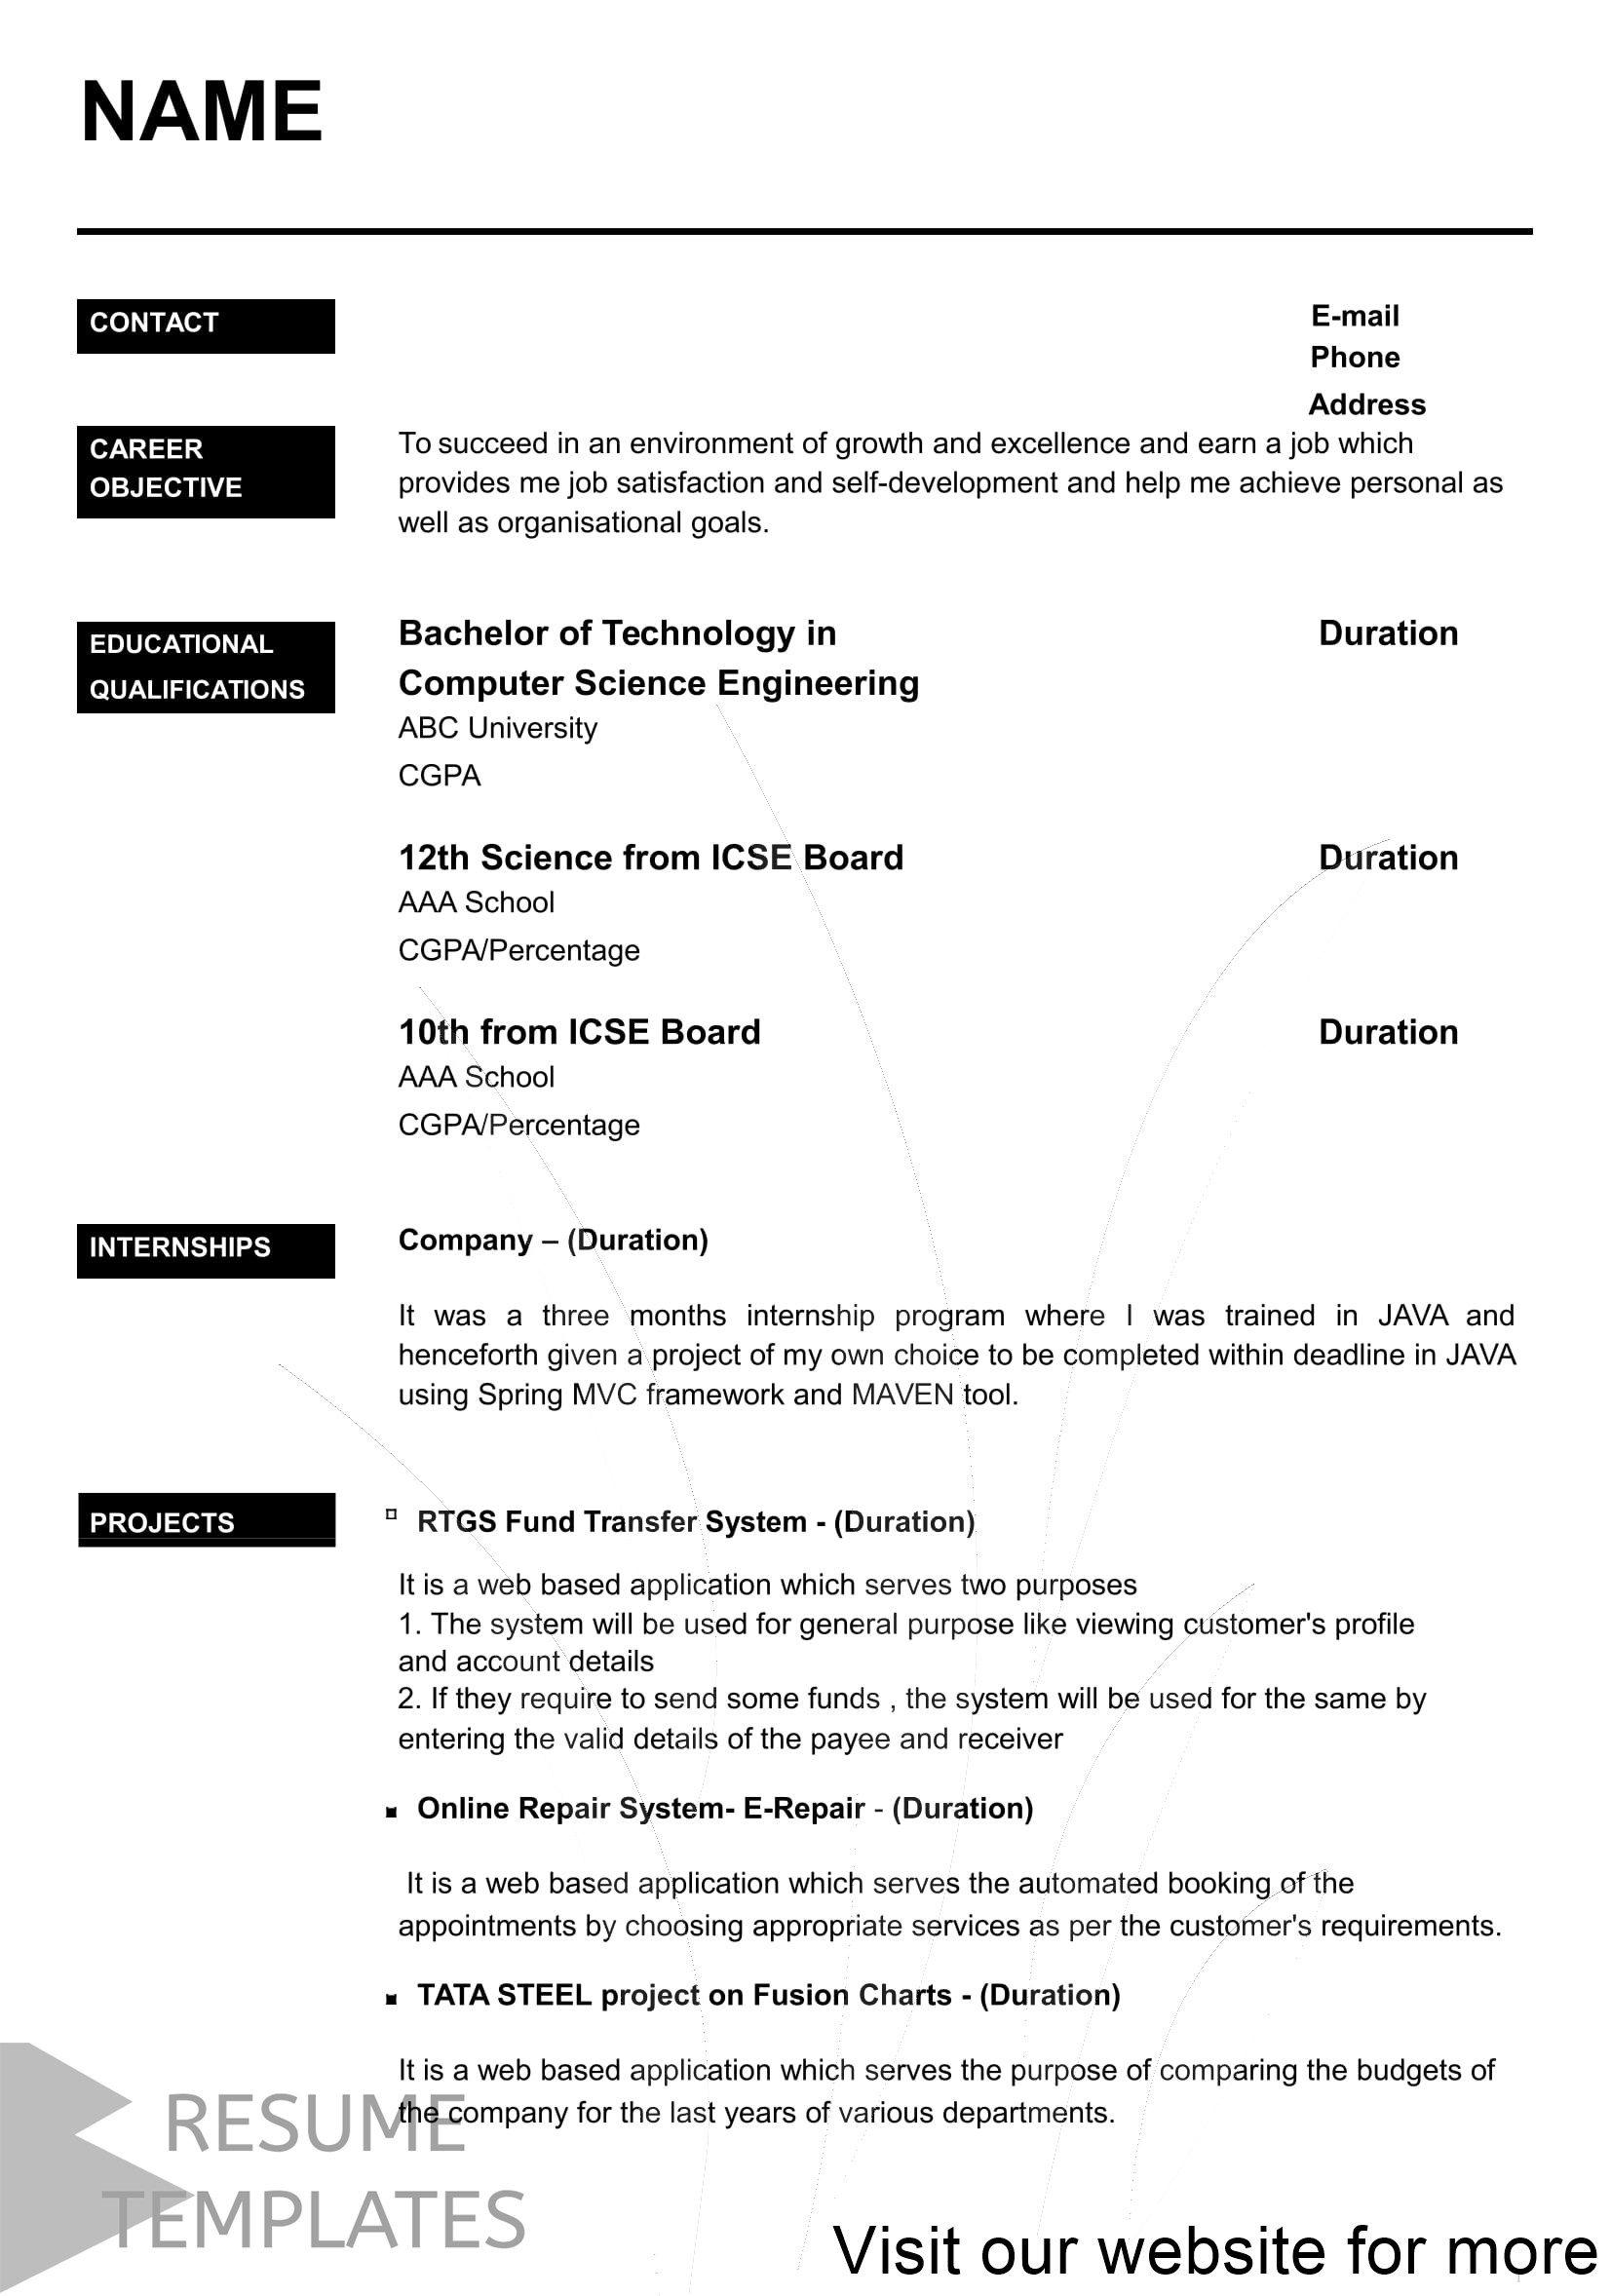 resume template, resume design, resume tips, resume